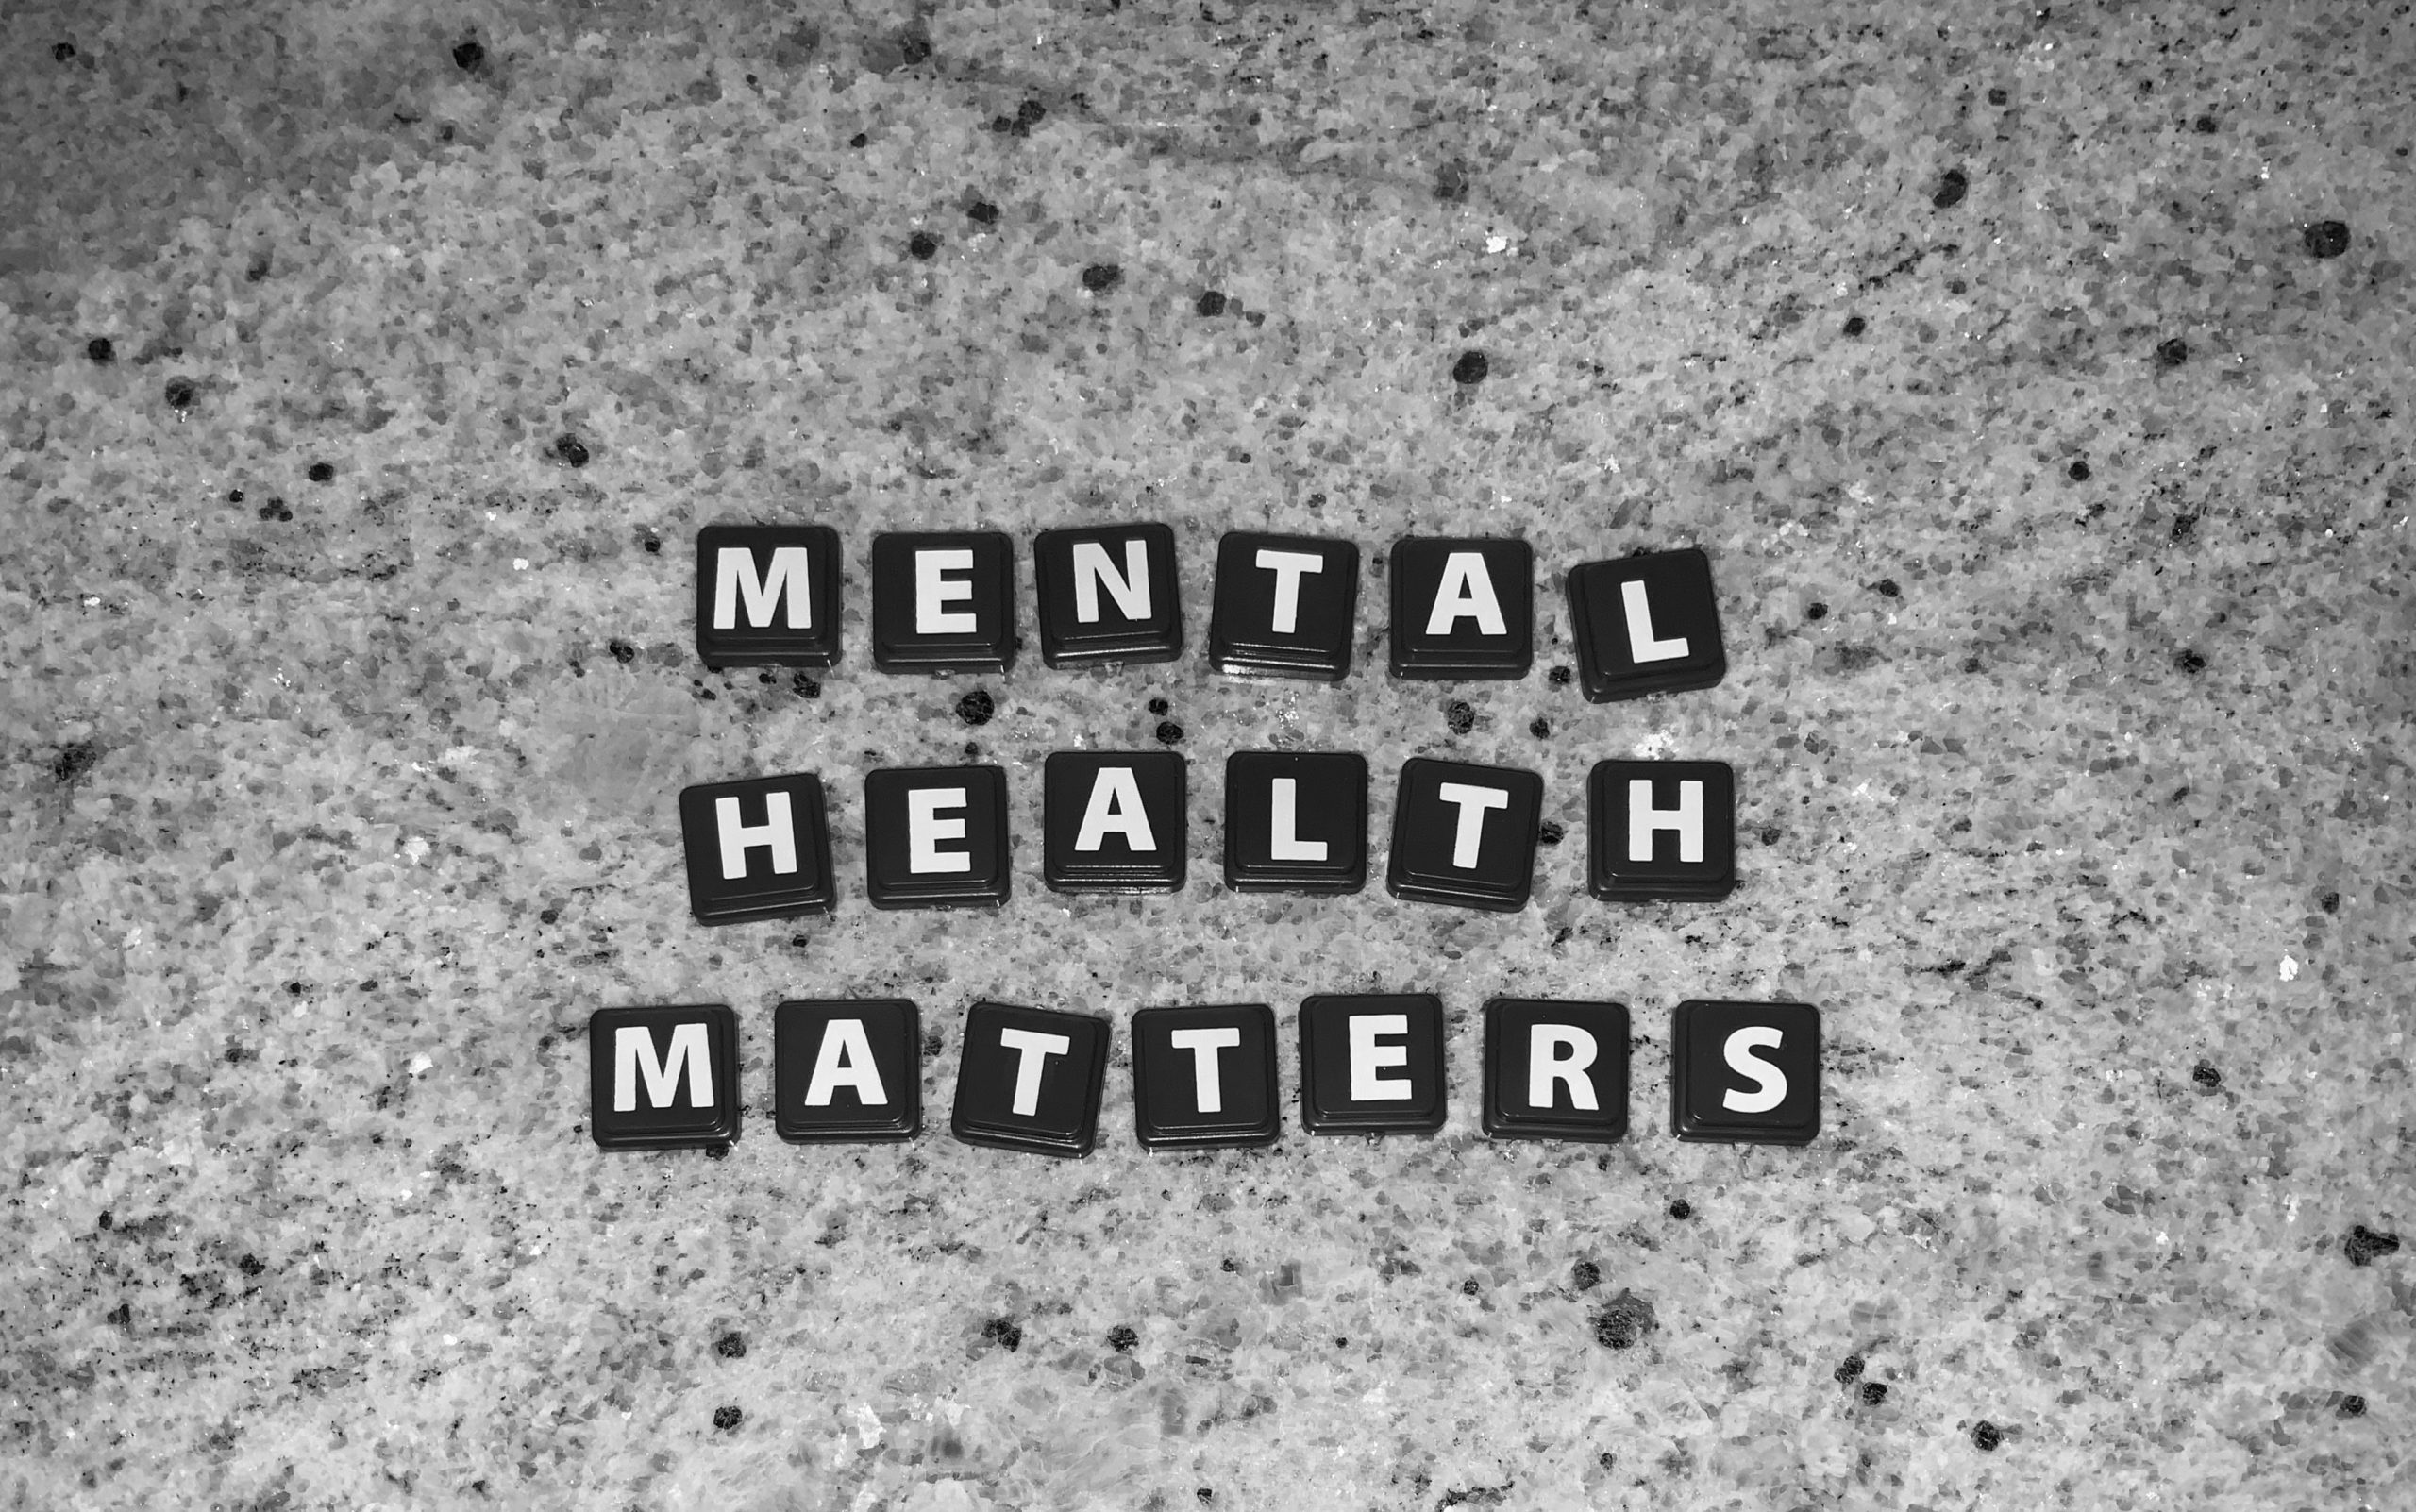 teen's mental health